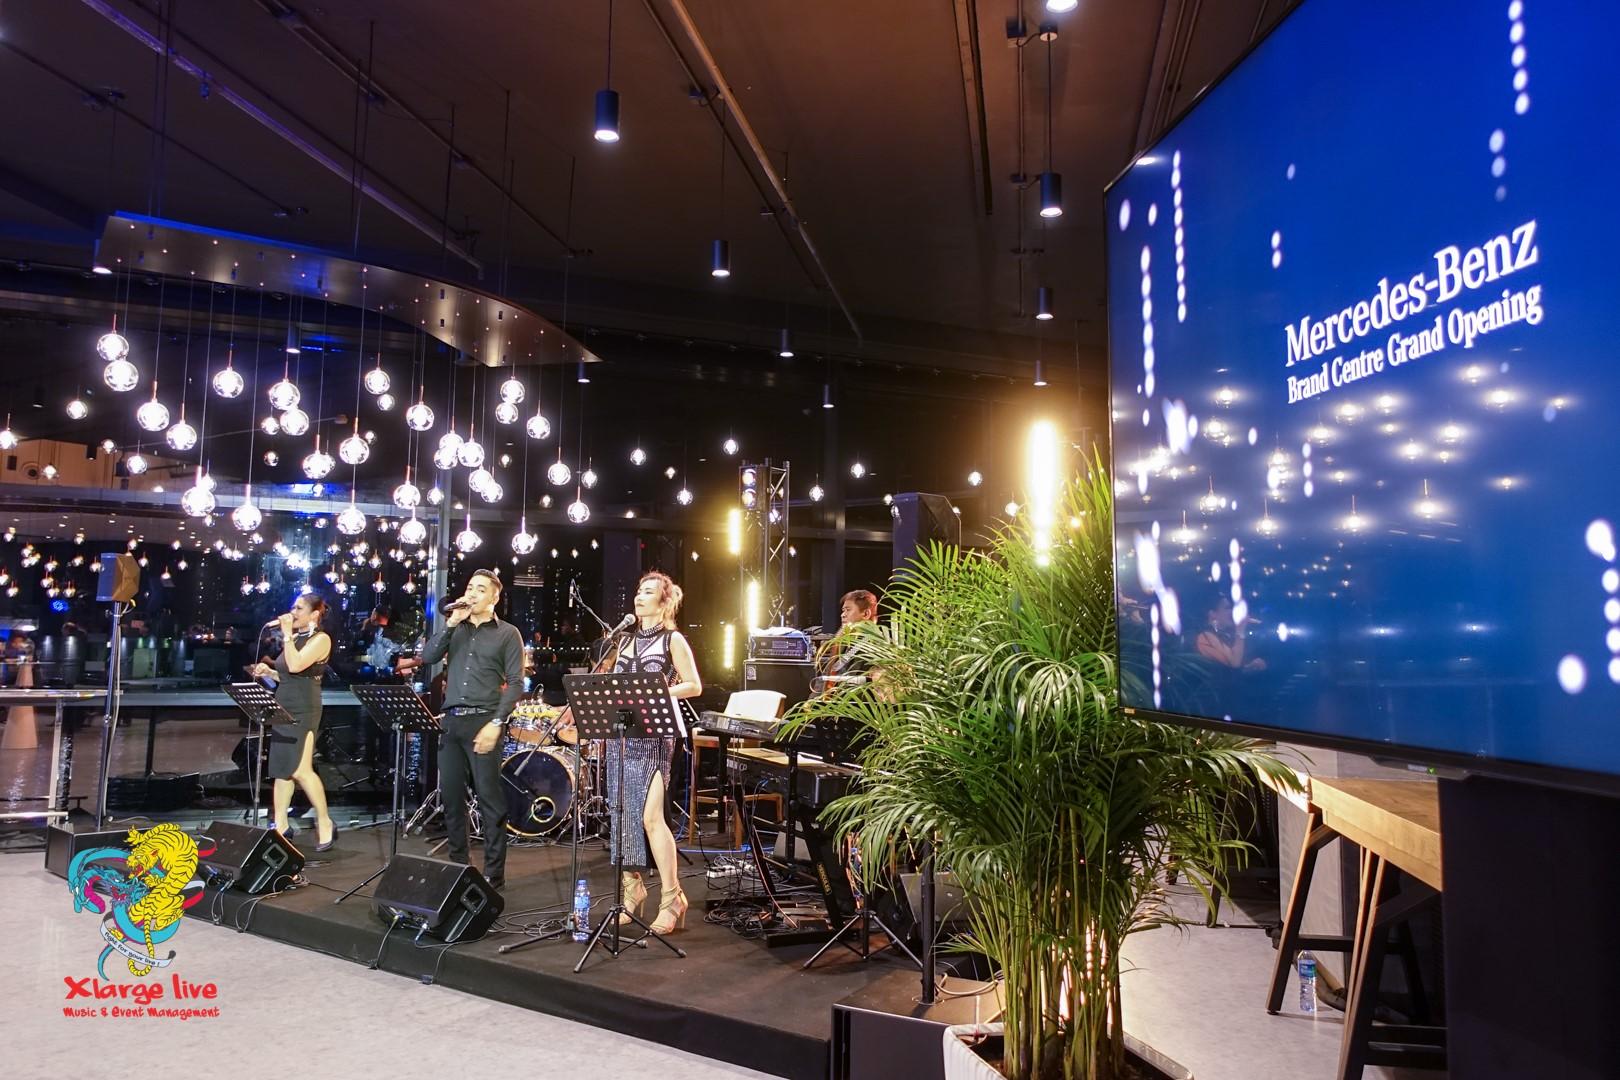 Mercedes Ben Brand Centre